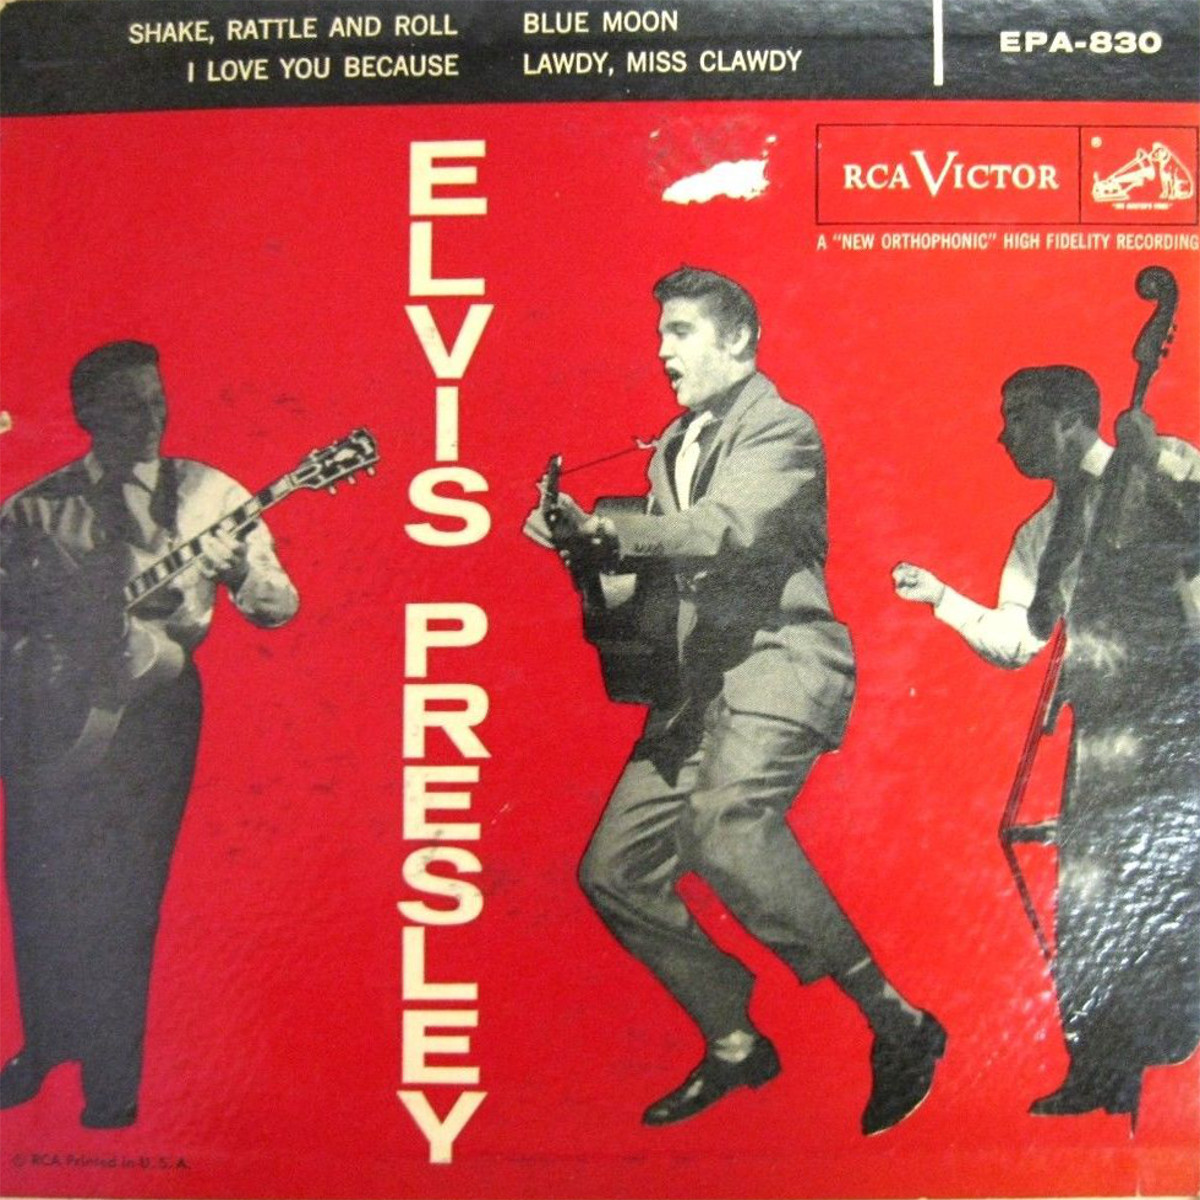 Presley - ELVIS PRESLEY Epa830aijr2l